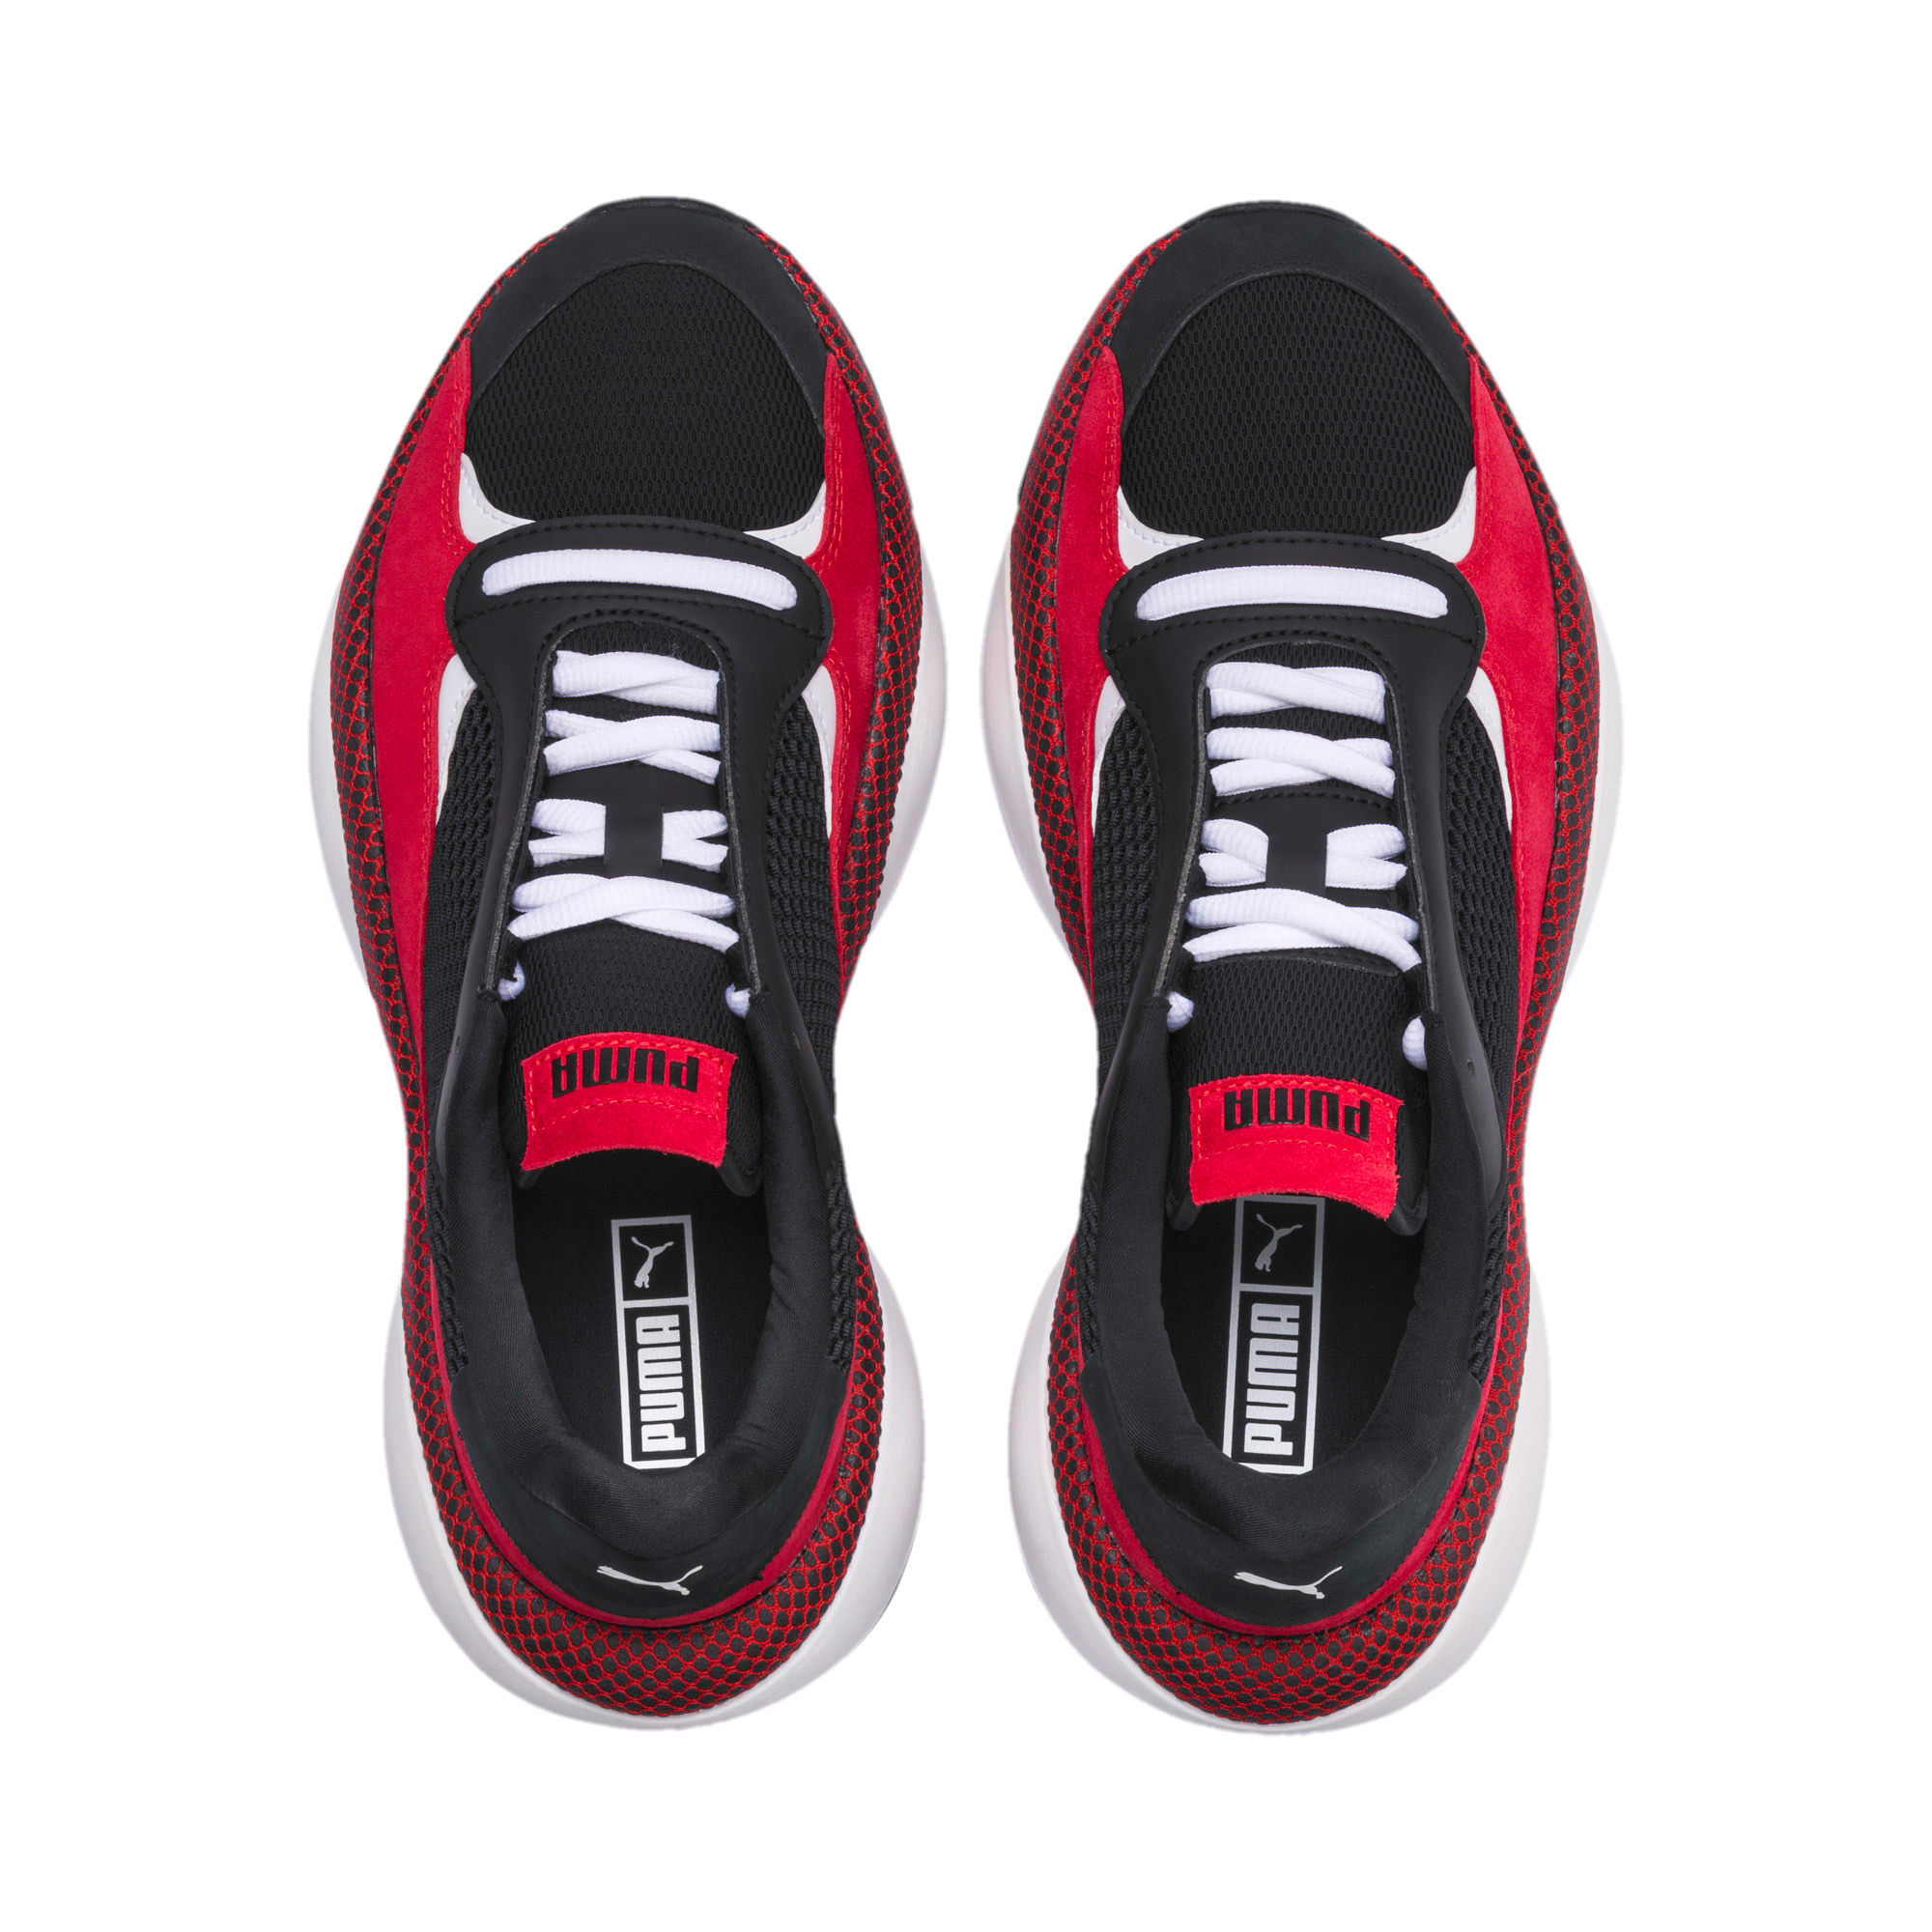 Thumbnail 7 of Alteration Blitz Sneakers, Puma Black-High Risk Red, medium